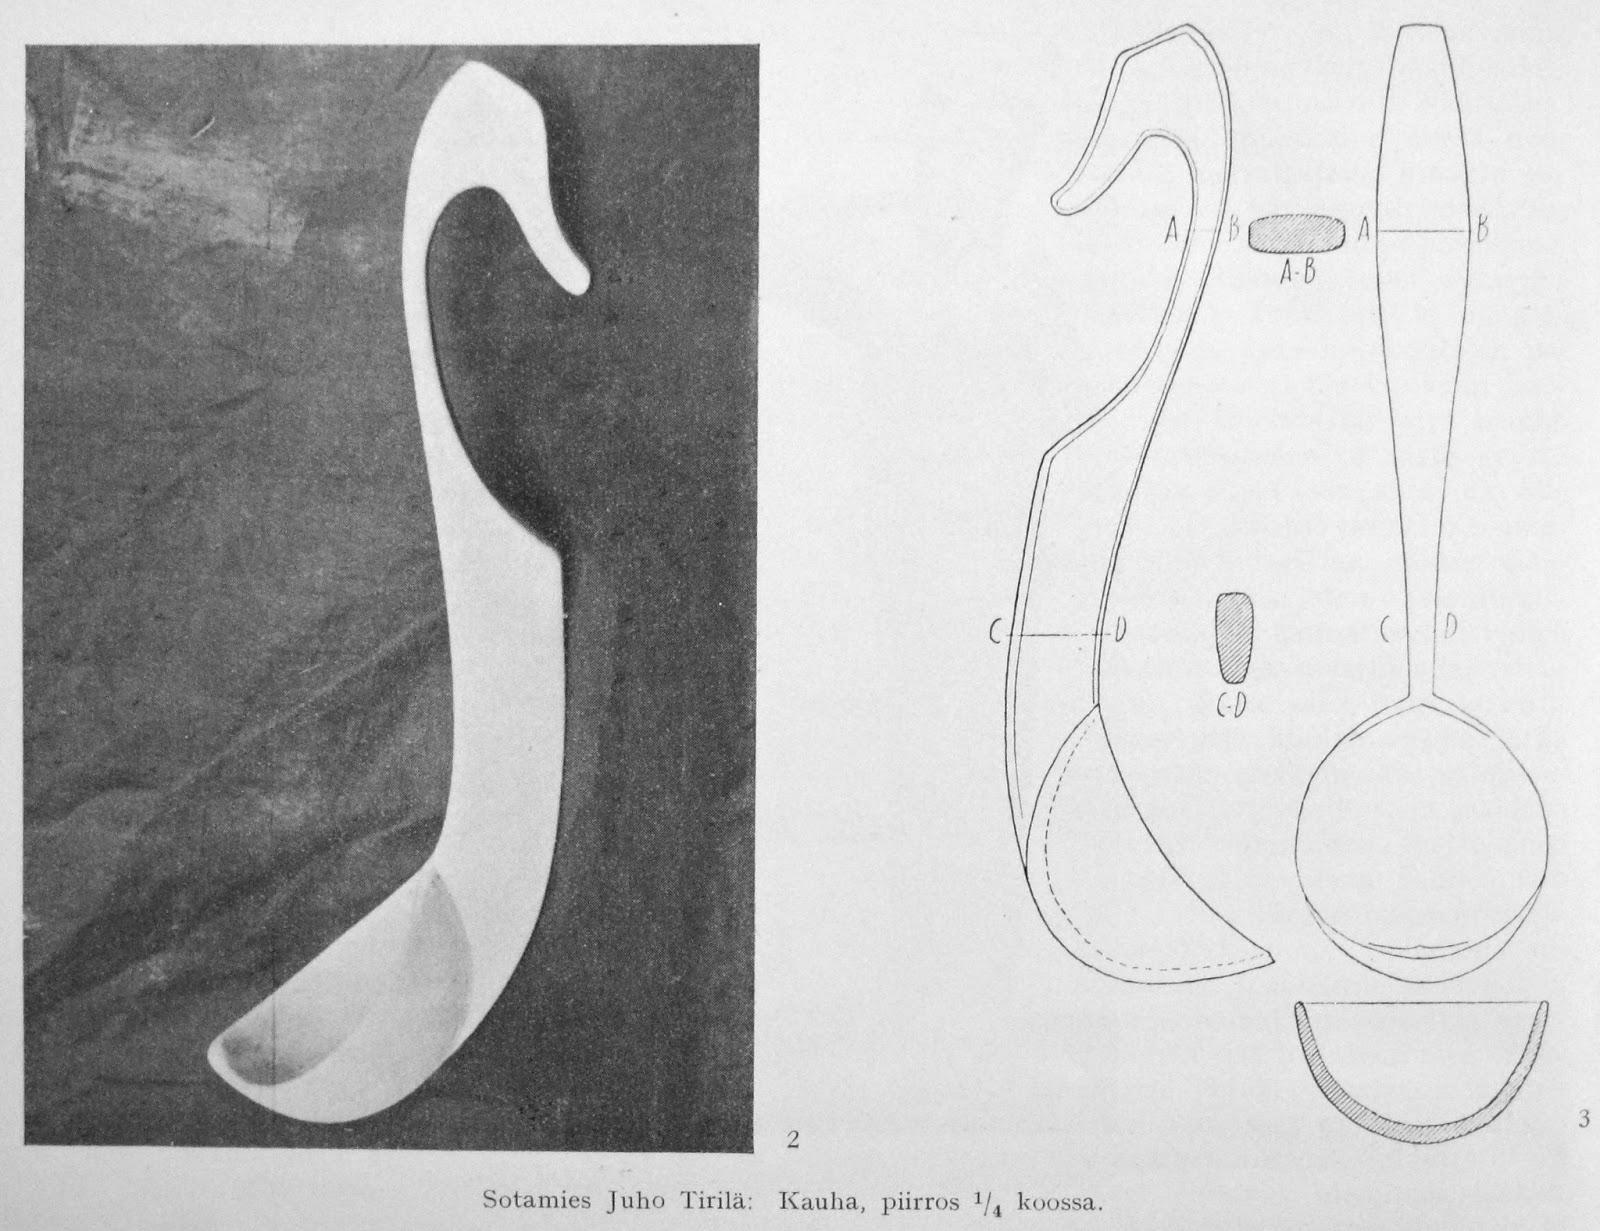 Woodsman crafts finnish spoon design plans